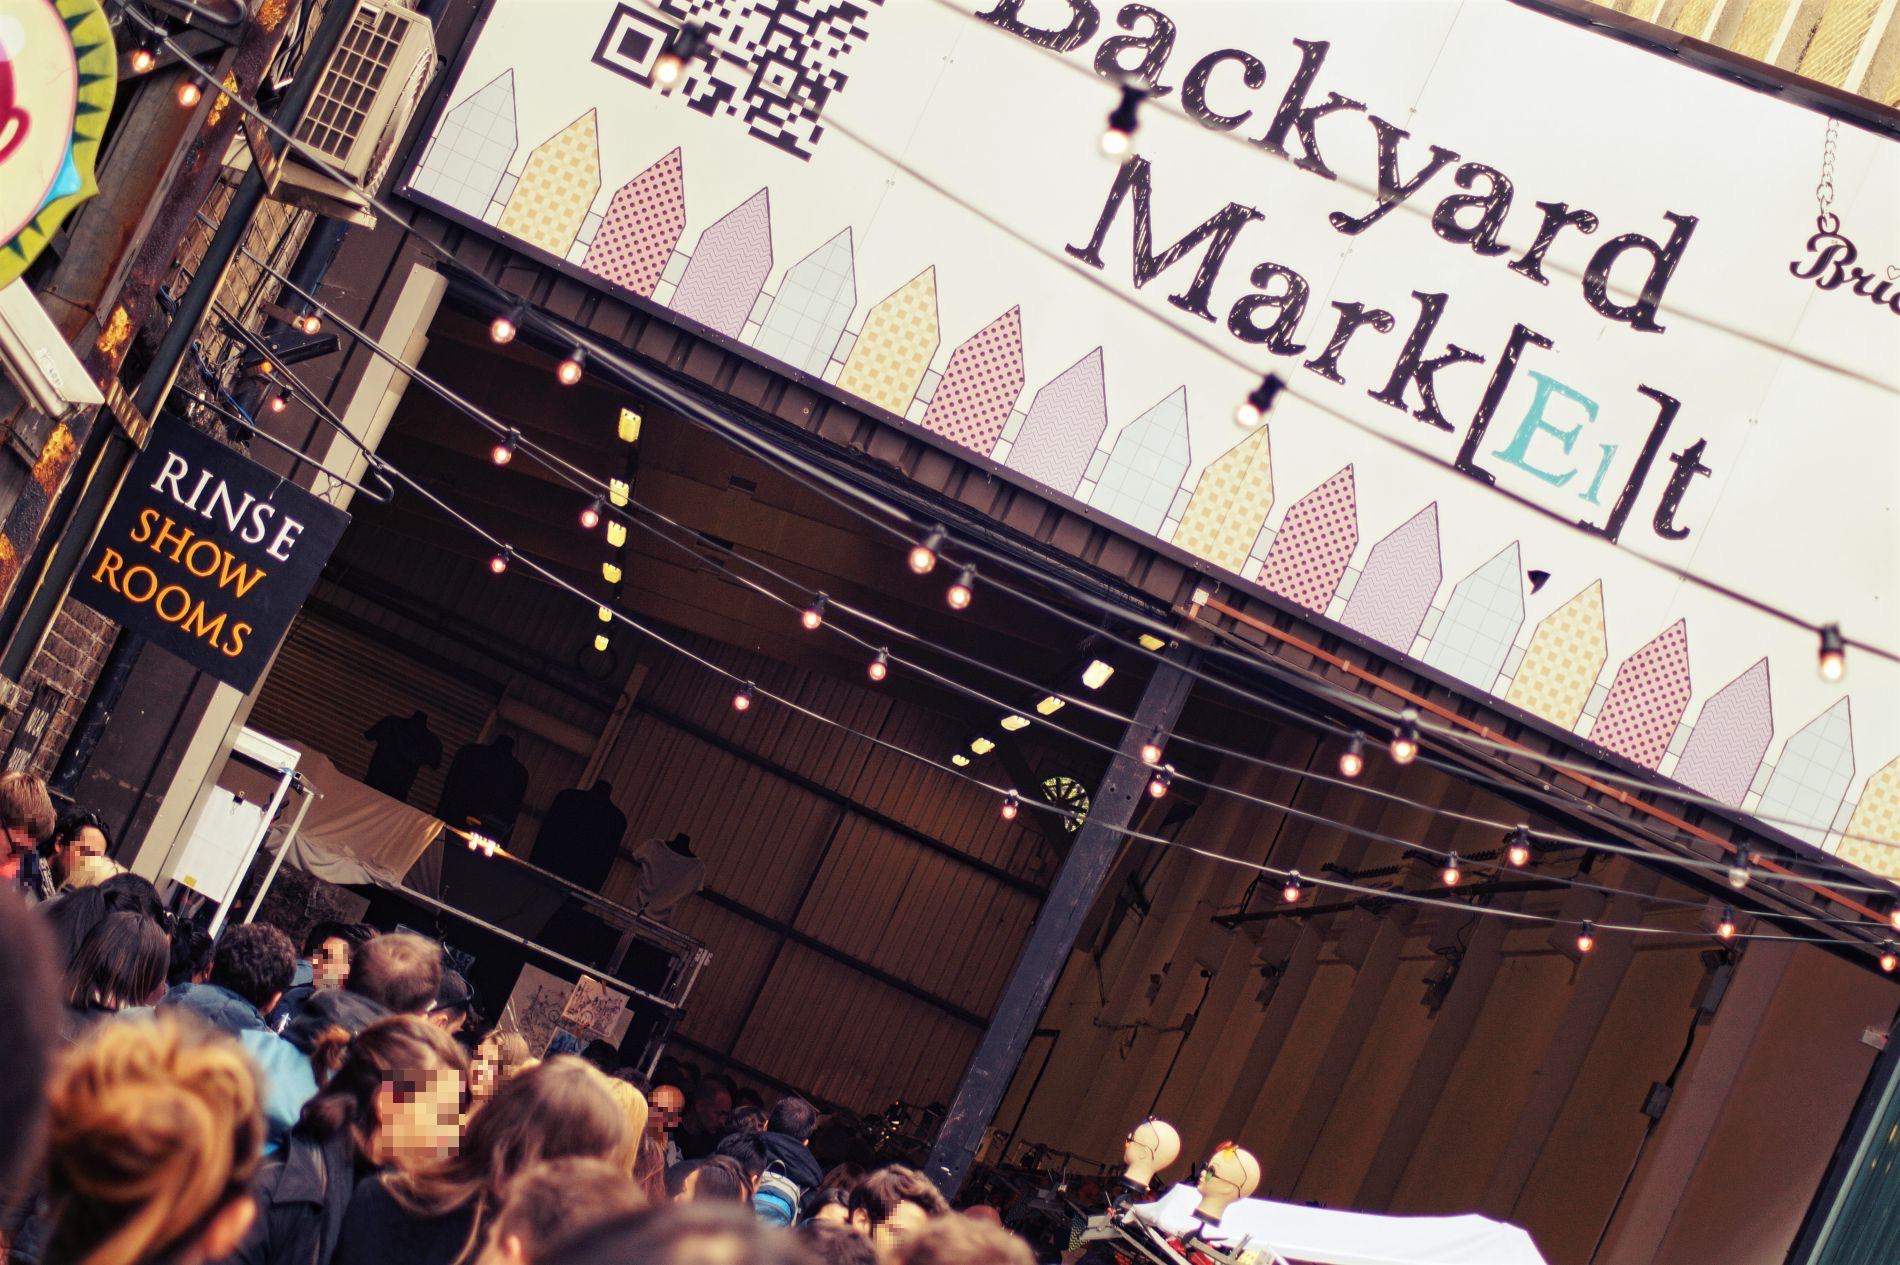 Brick Lane Market - das Alternative London - Londonblogger.de